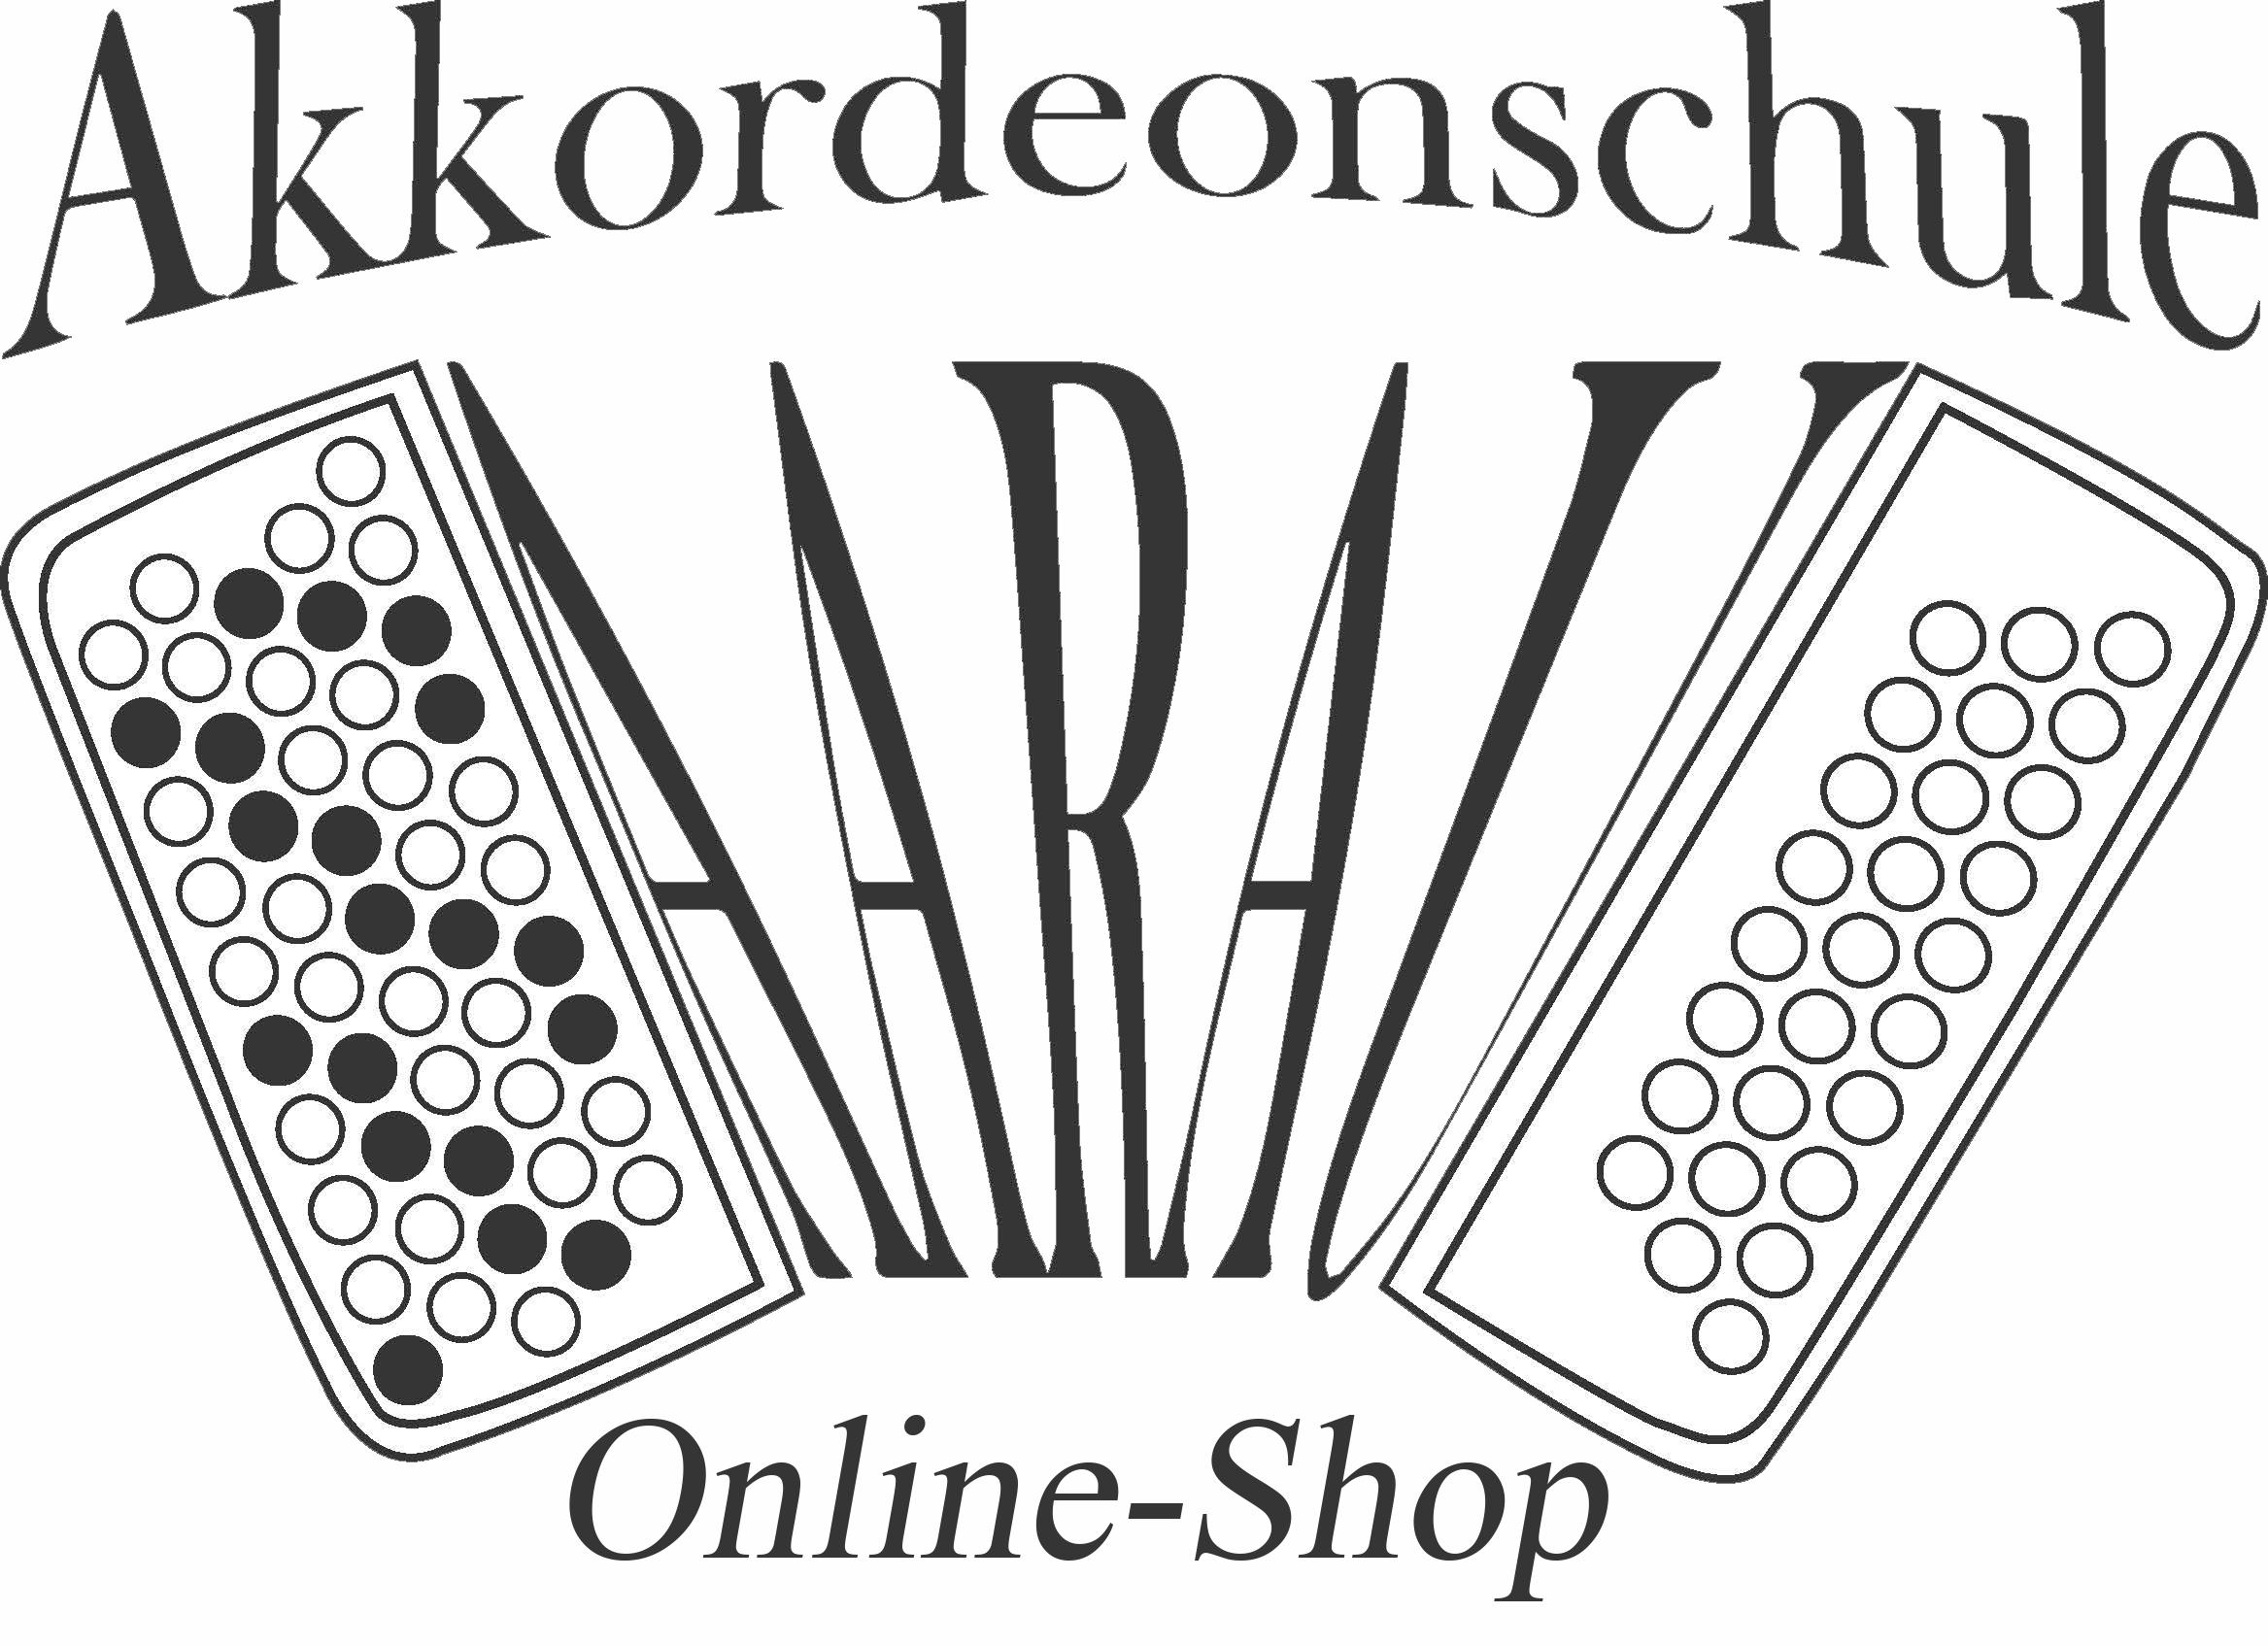 Akkordeonschule Aarau Shop-Logo